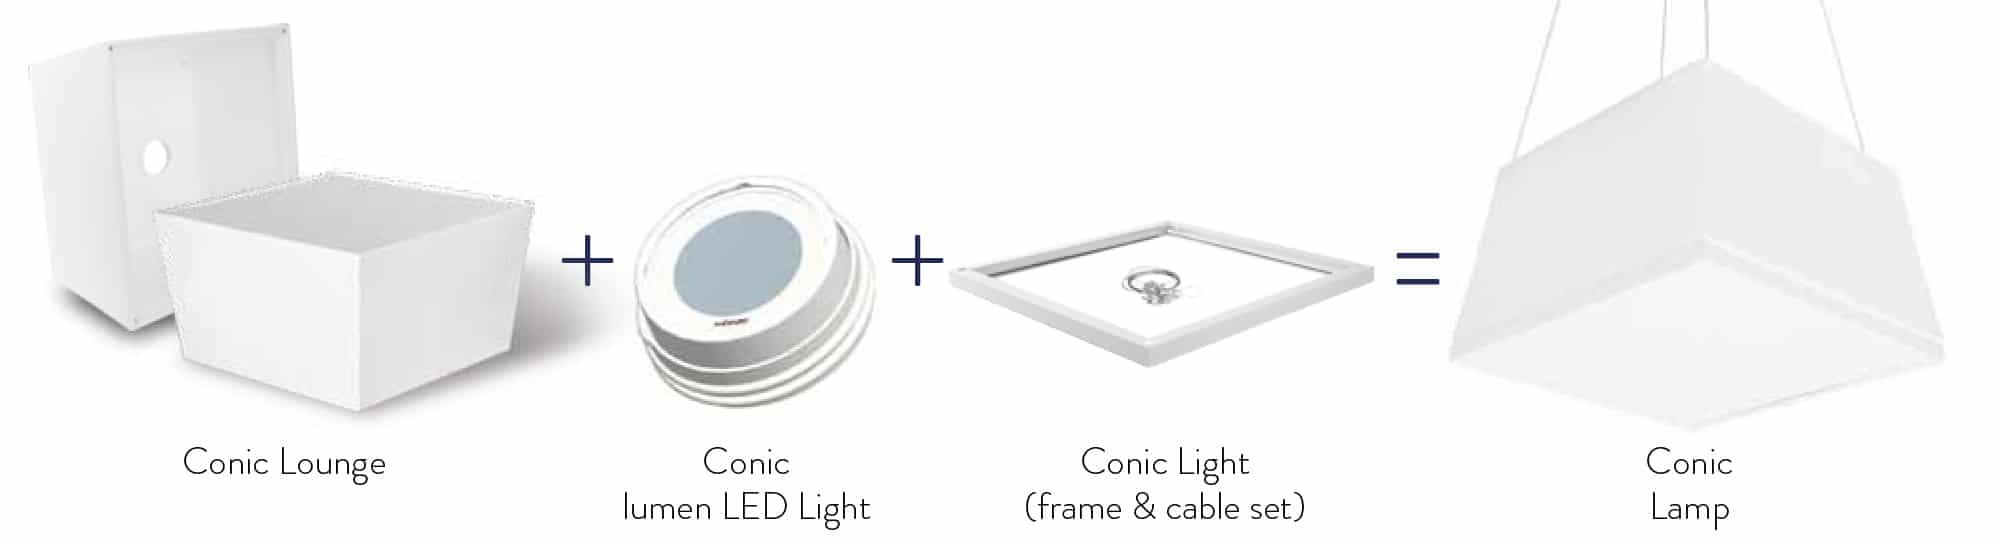 Conic Light producten